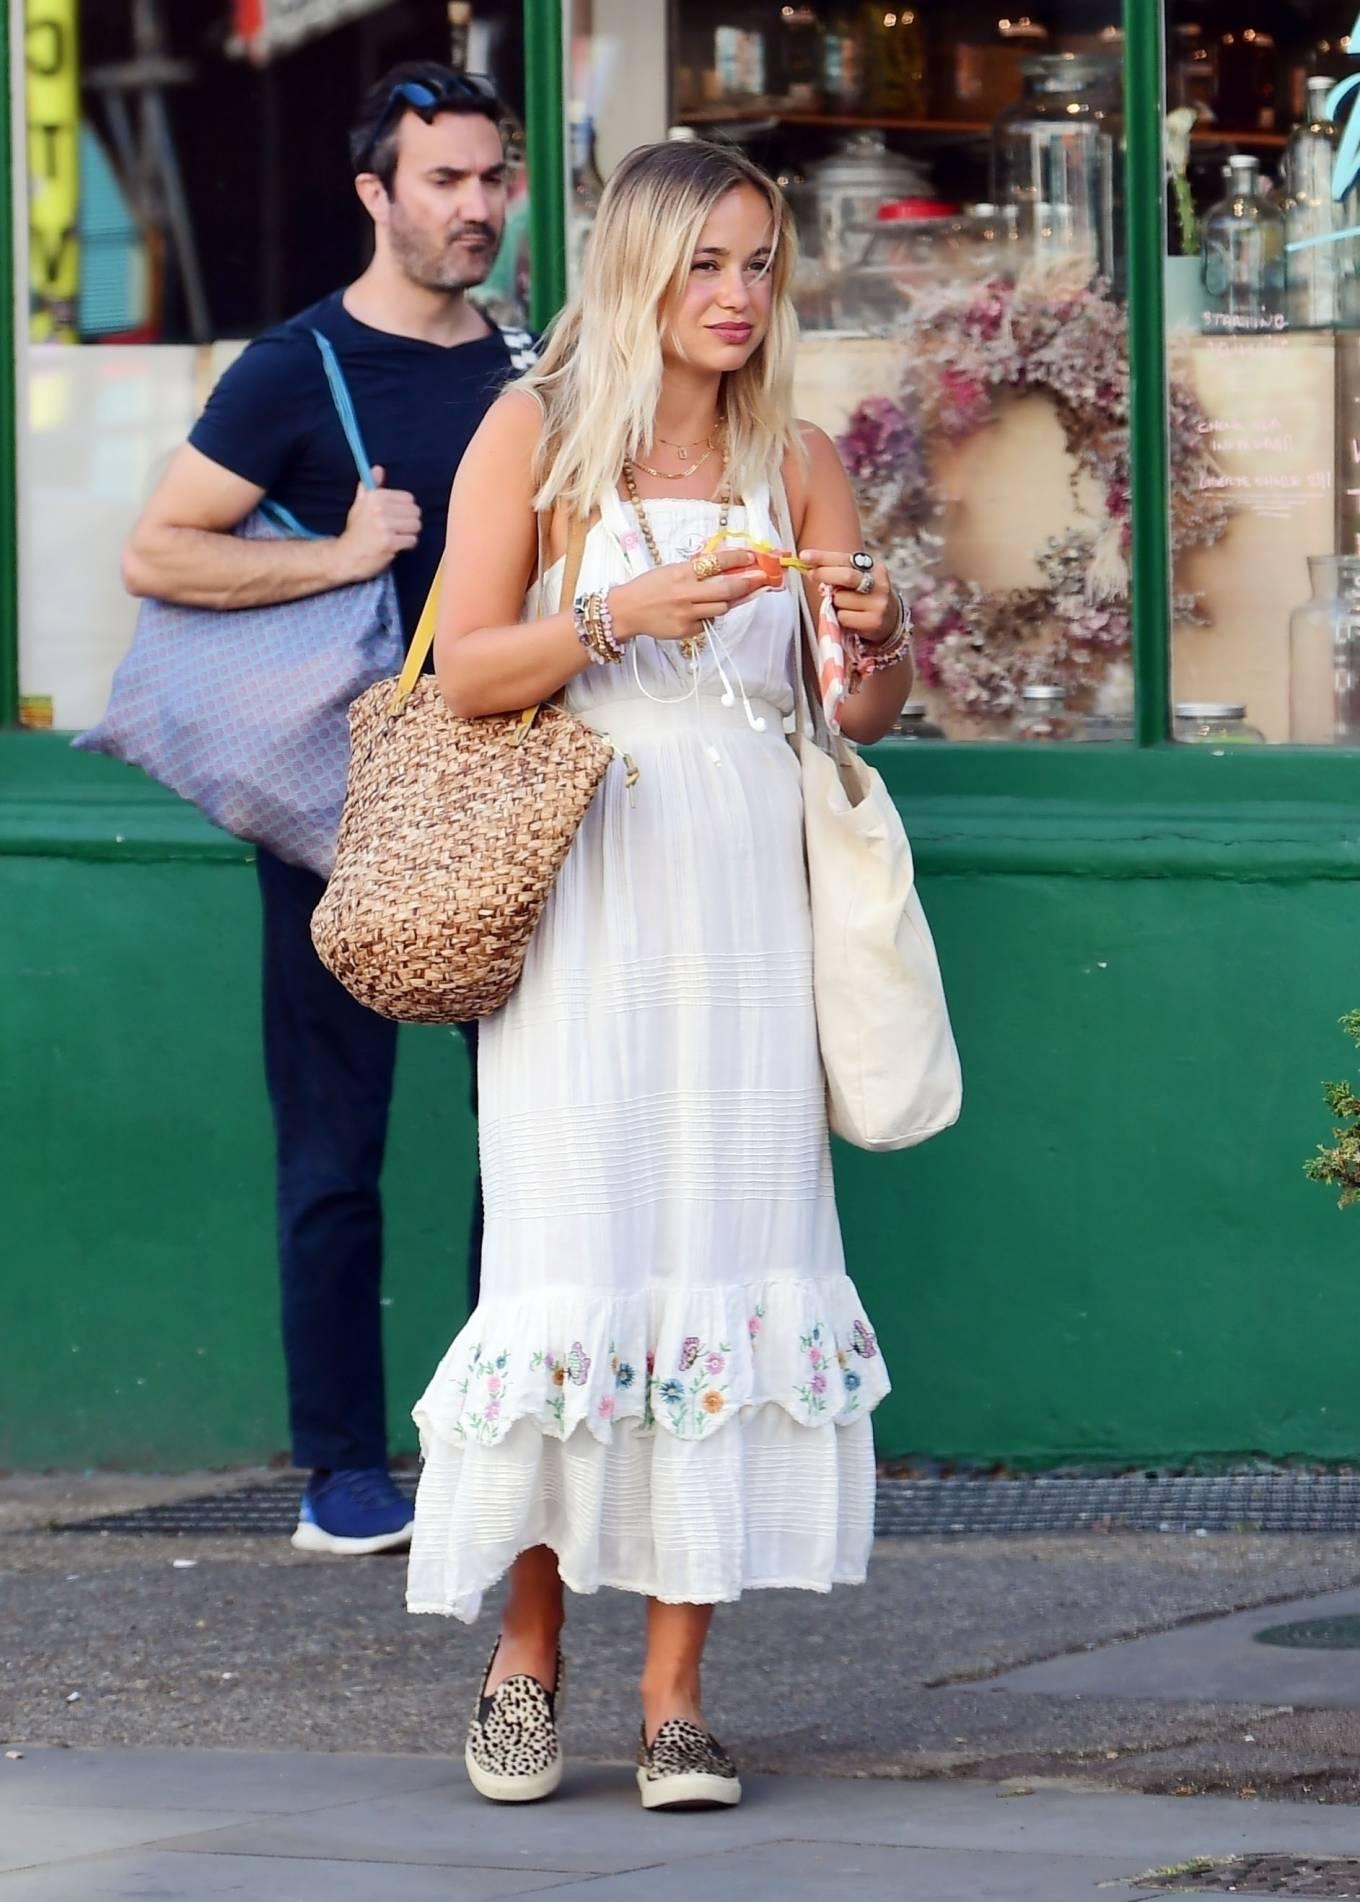 Amelia Windsor 2020 : Amelia Windsor – Looks stunning in a white summery dress in London-12